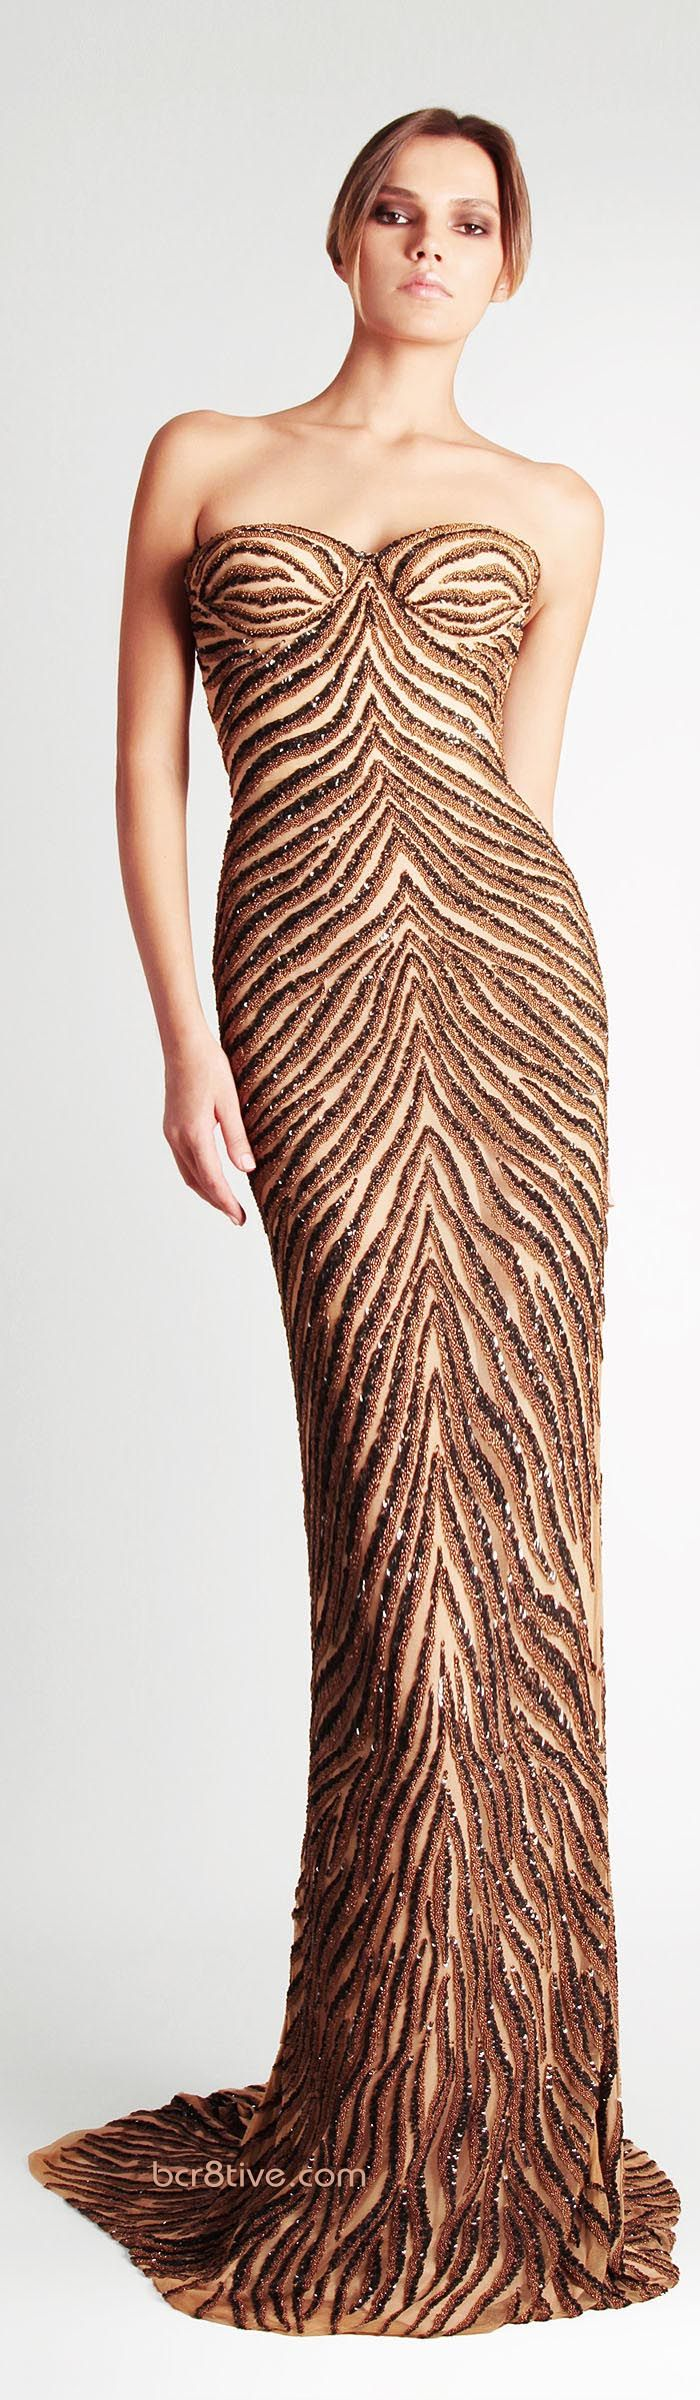 Best 25+ Designer evening gowns ideas on Pinterest | Prom sherri ...